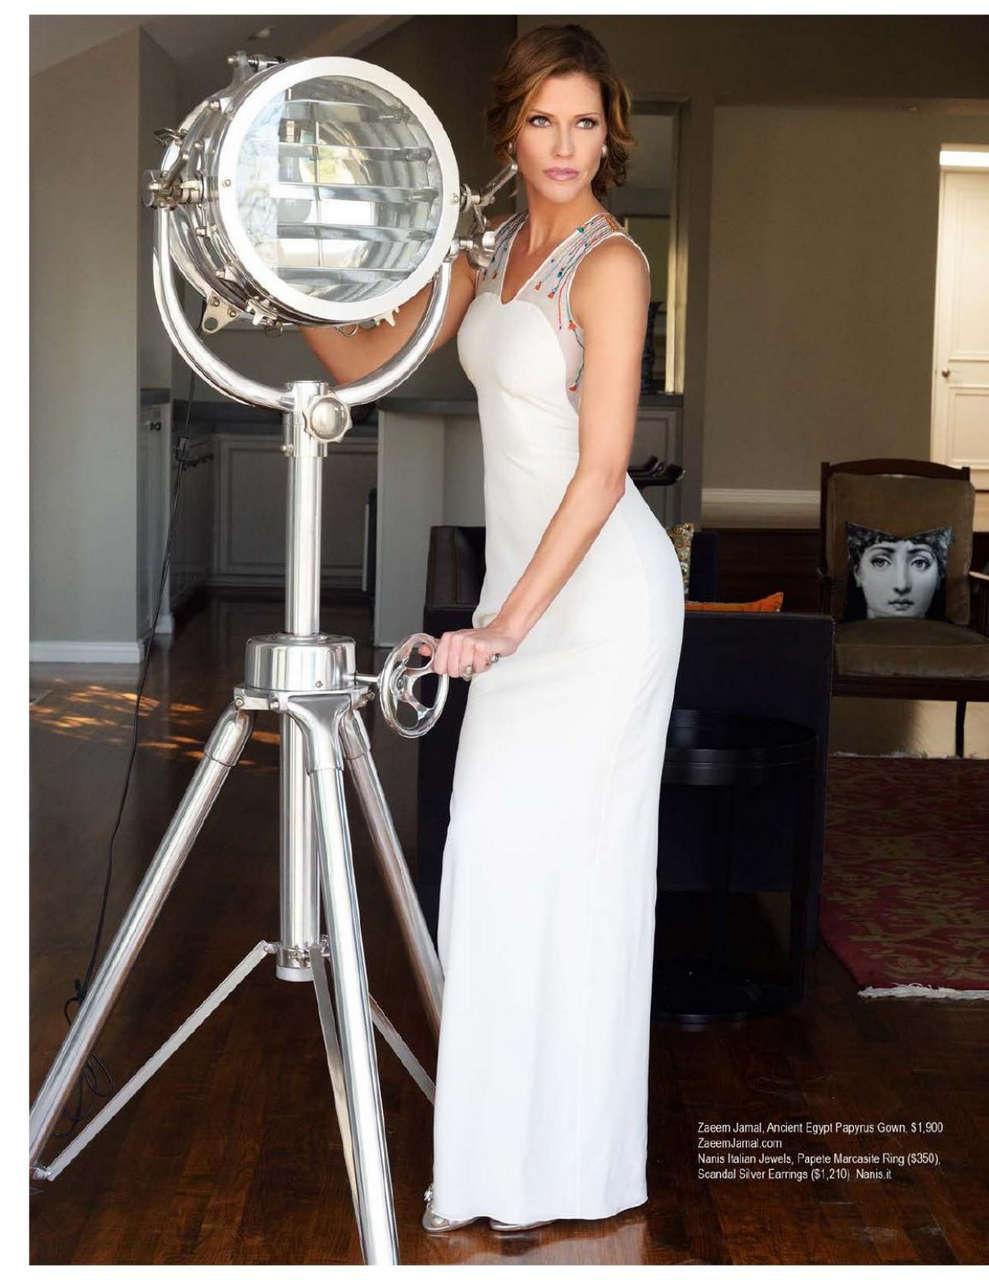 Tricia Helfer Regard Magazine February 2014 Issue